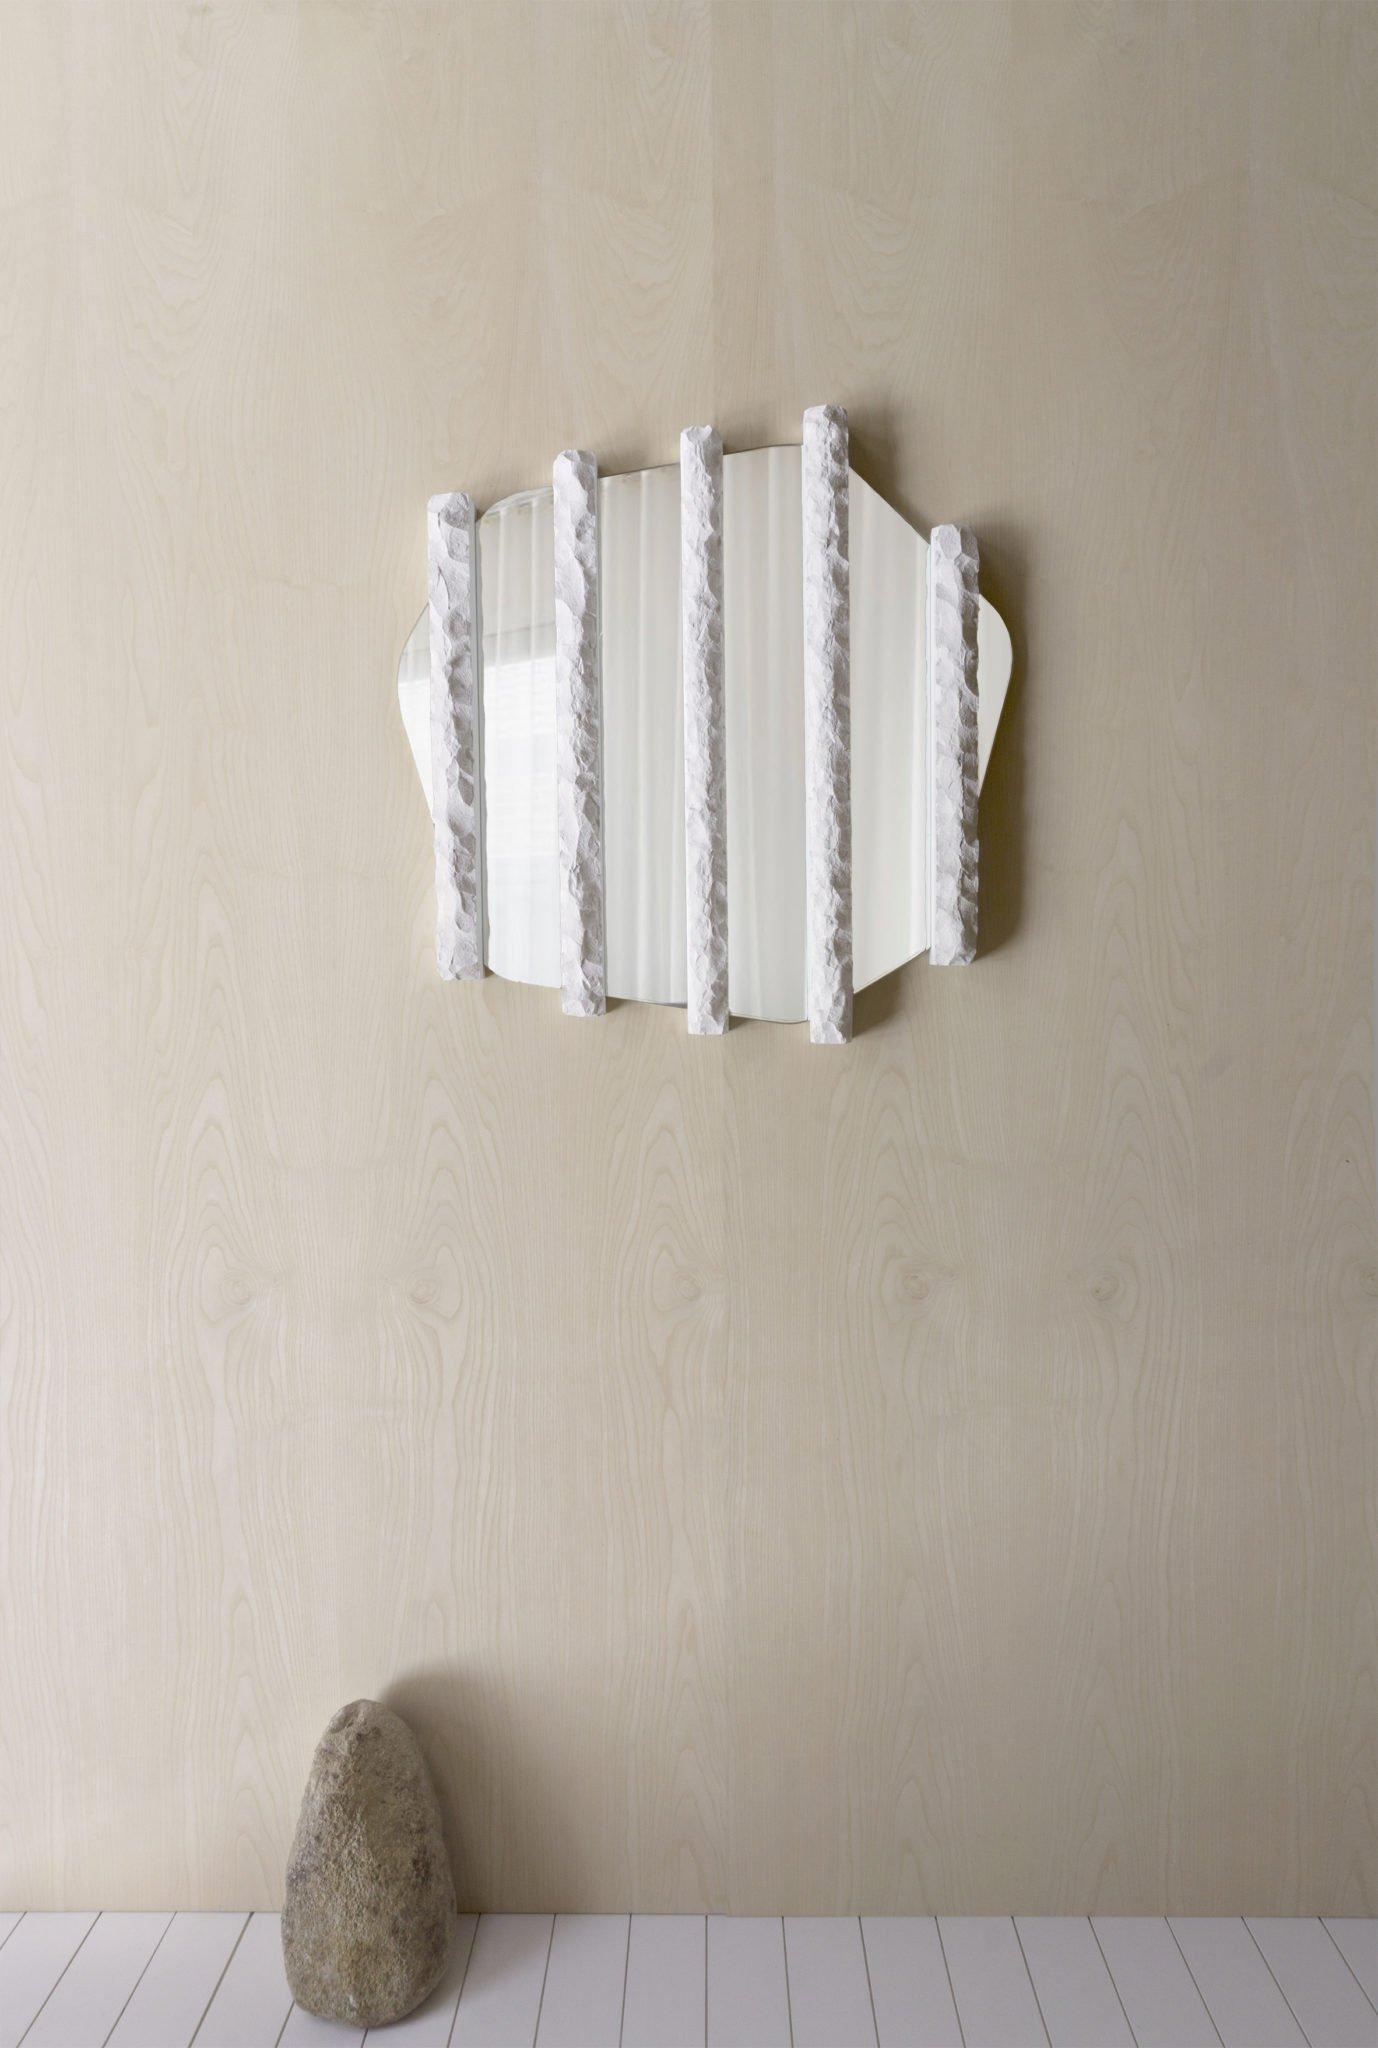 offsite-online-Simon-Johns_Coffee-Fracture-Mirror-huskdesignblog